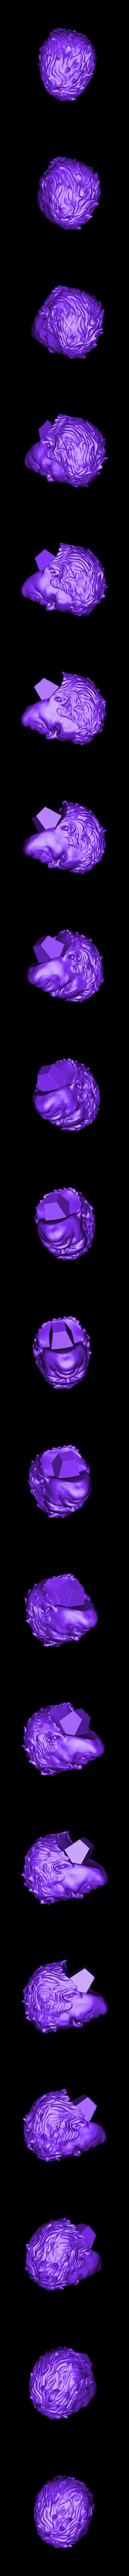 Head_225mm.stl Download STL file Hulk Angry - Super Hero - Marvel 3D print model • 3D print model, Bstar3Dart